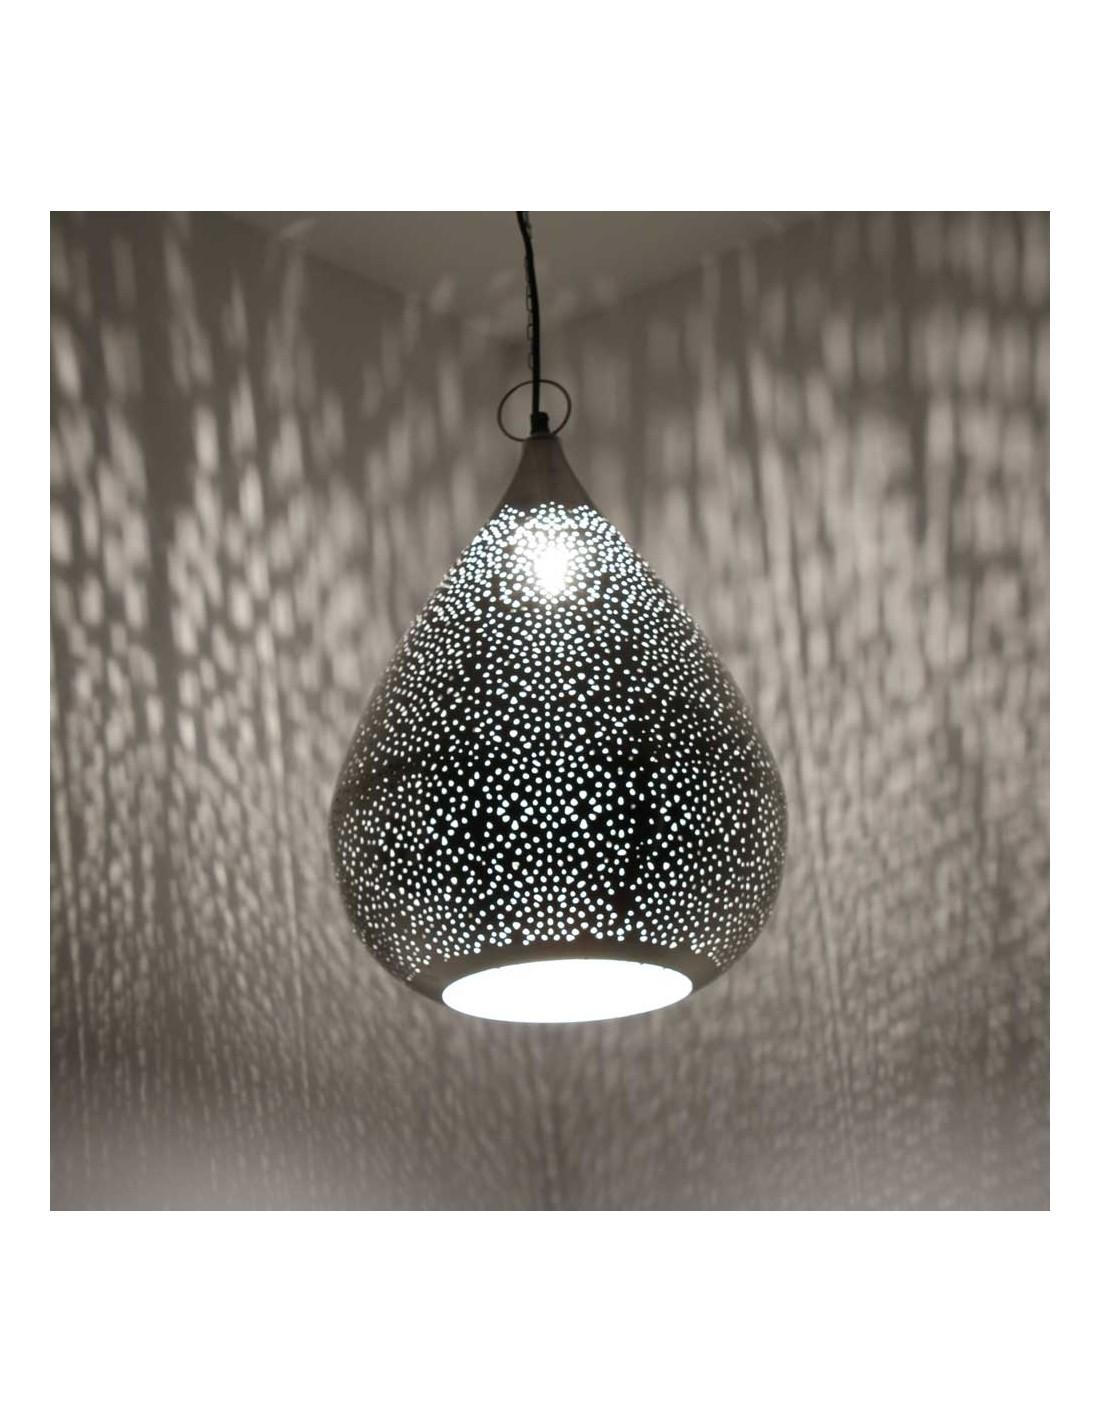 orientalische h ngelampe najia 45cm in tropfenform albena shop. Black Bedroom Furniture Sets. Home Design Ideas